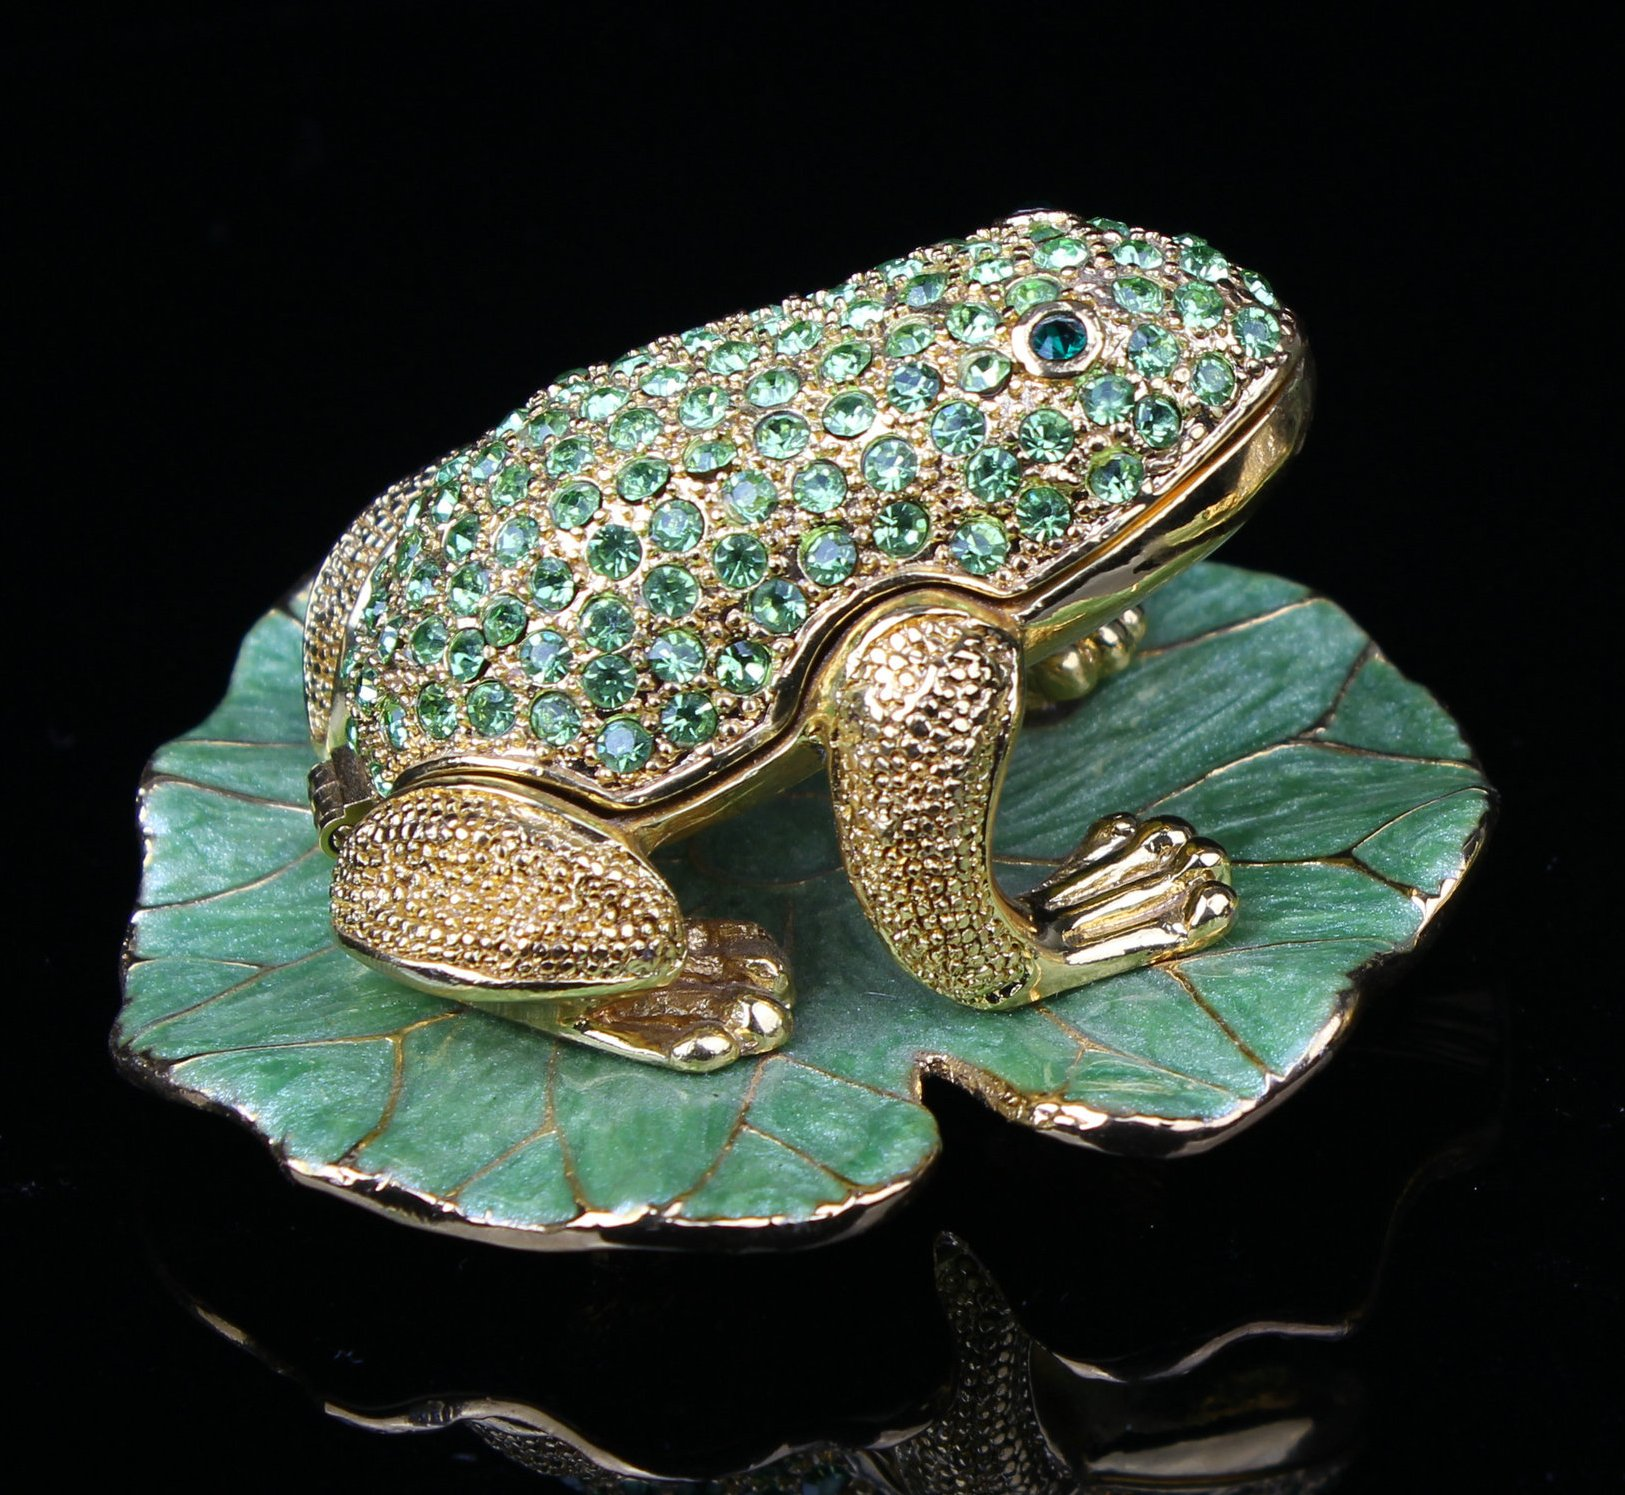 Vintage Frog on Lotus Figurine Collection Crystal Animal Trinket Box Casket Home Decoration Souvenir Gift Metal Crafts (8*8*4.5 cm (L*W*H))